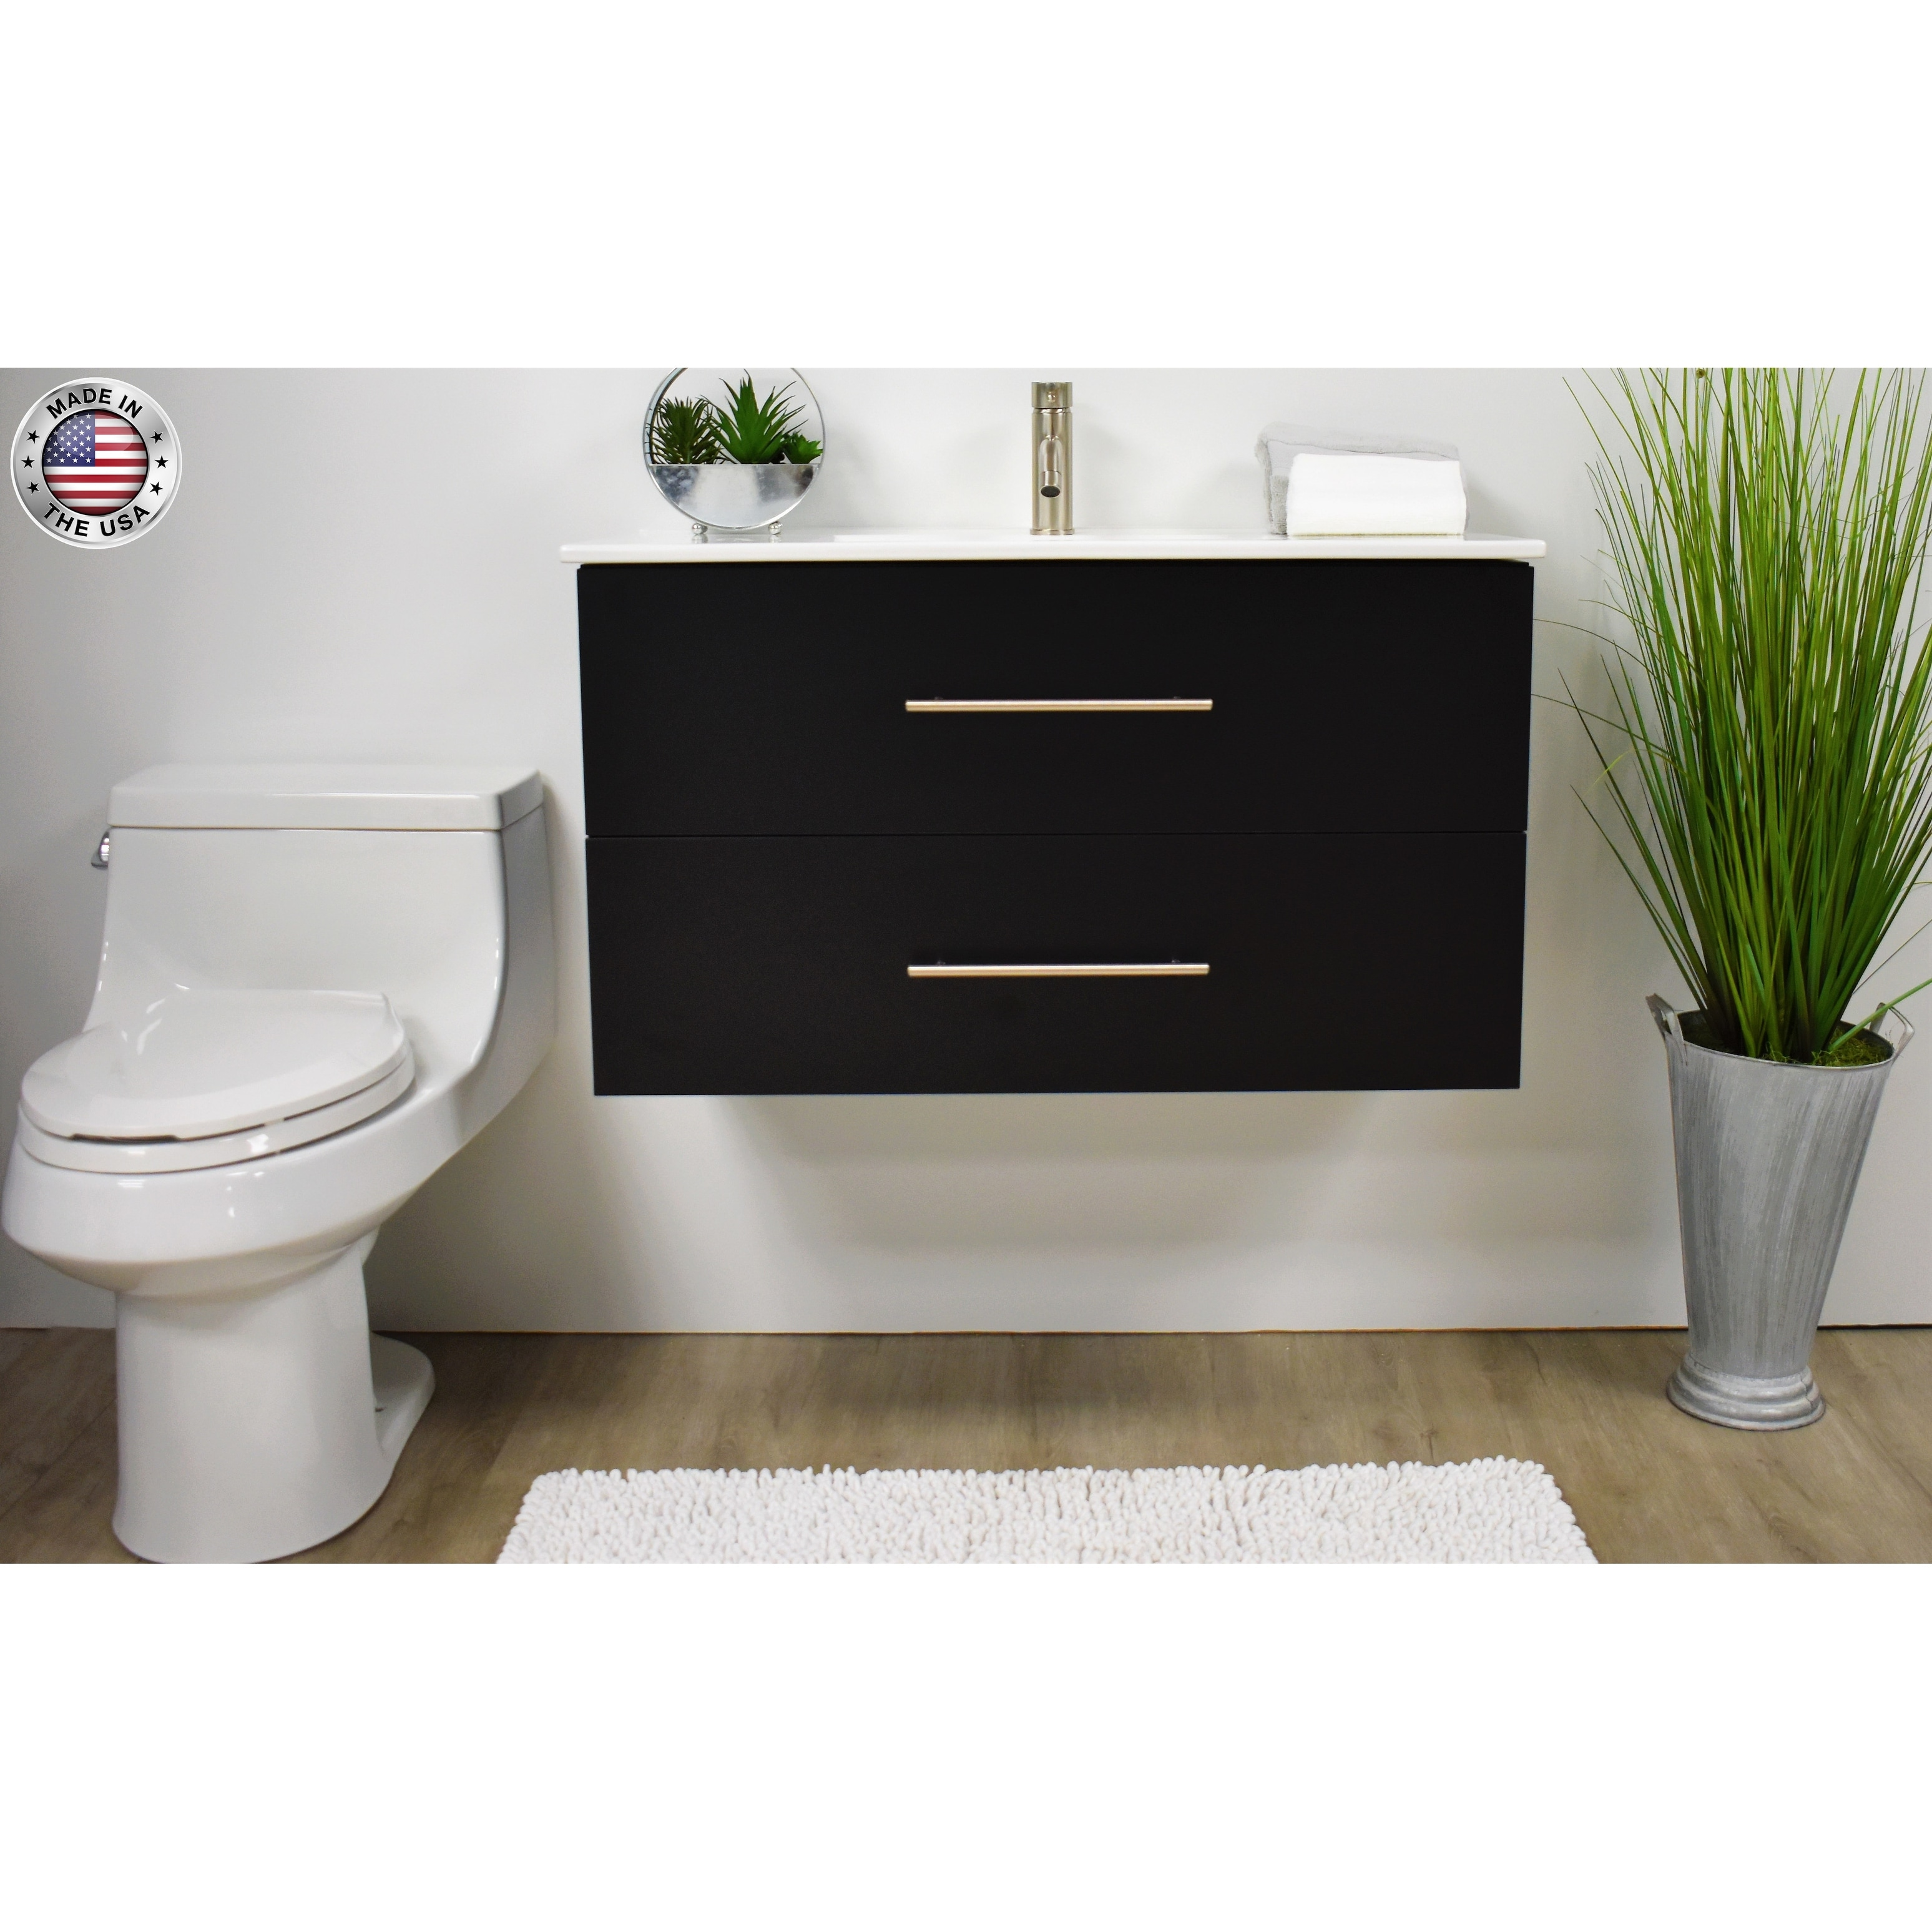 Volpa Usa Napa 30 Inch Black Wall Mounted Floating Bathroom Vanity Set Overstock 32207295